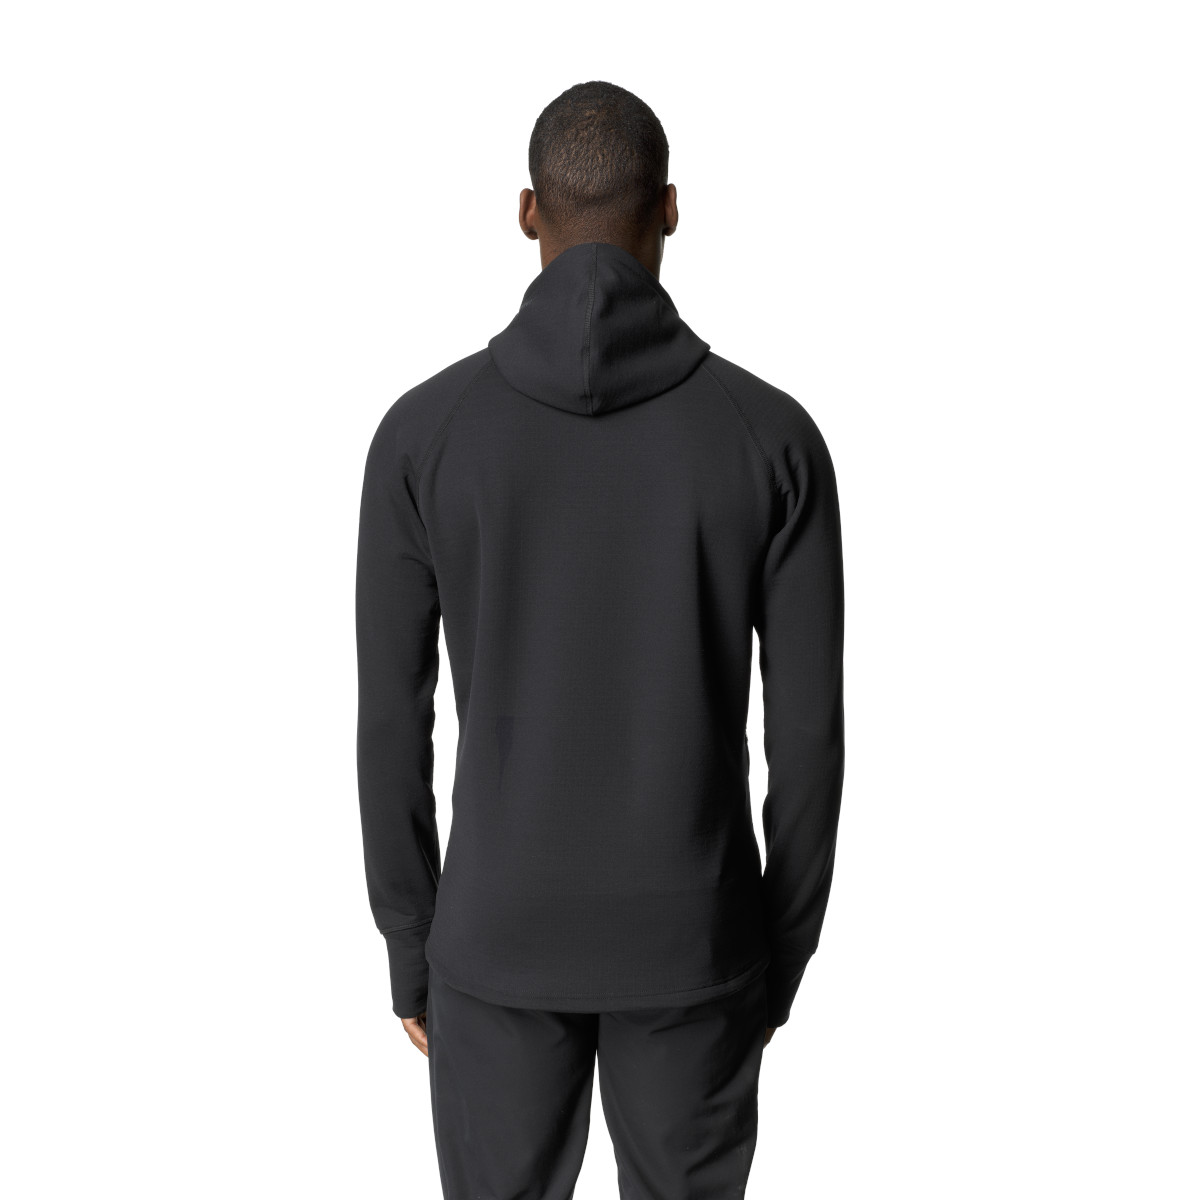 Image of Houdini Men's Mono Air Houdi Jacket - True Black